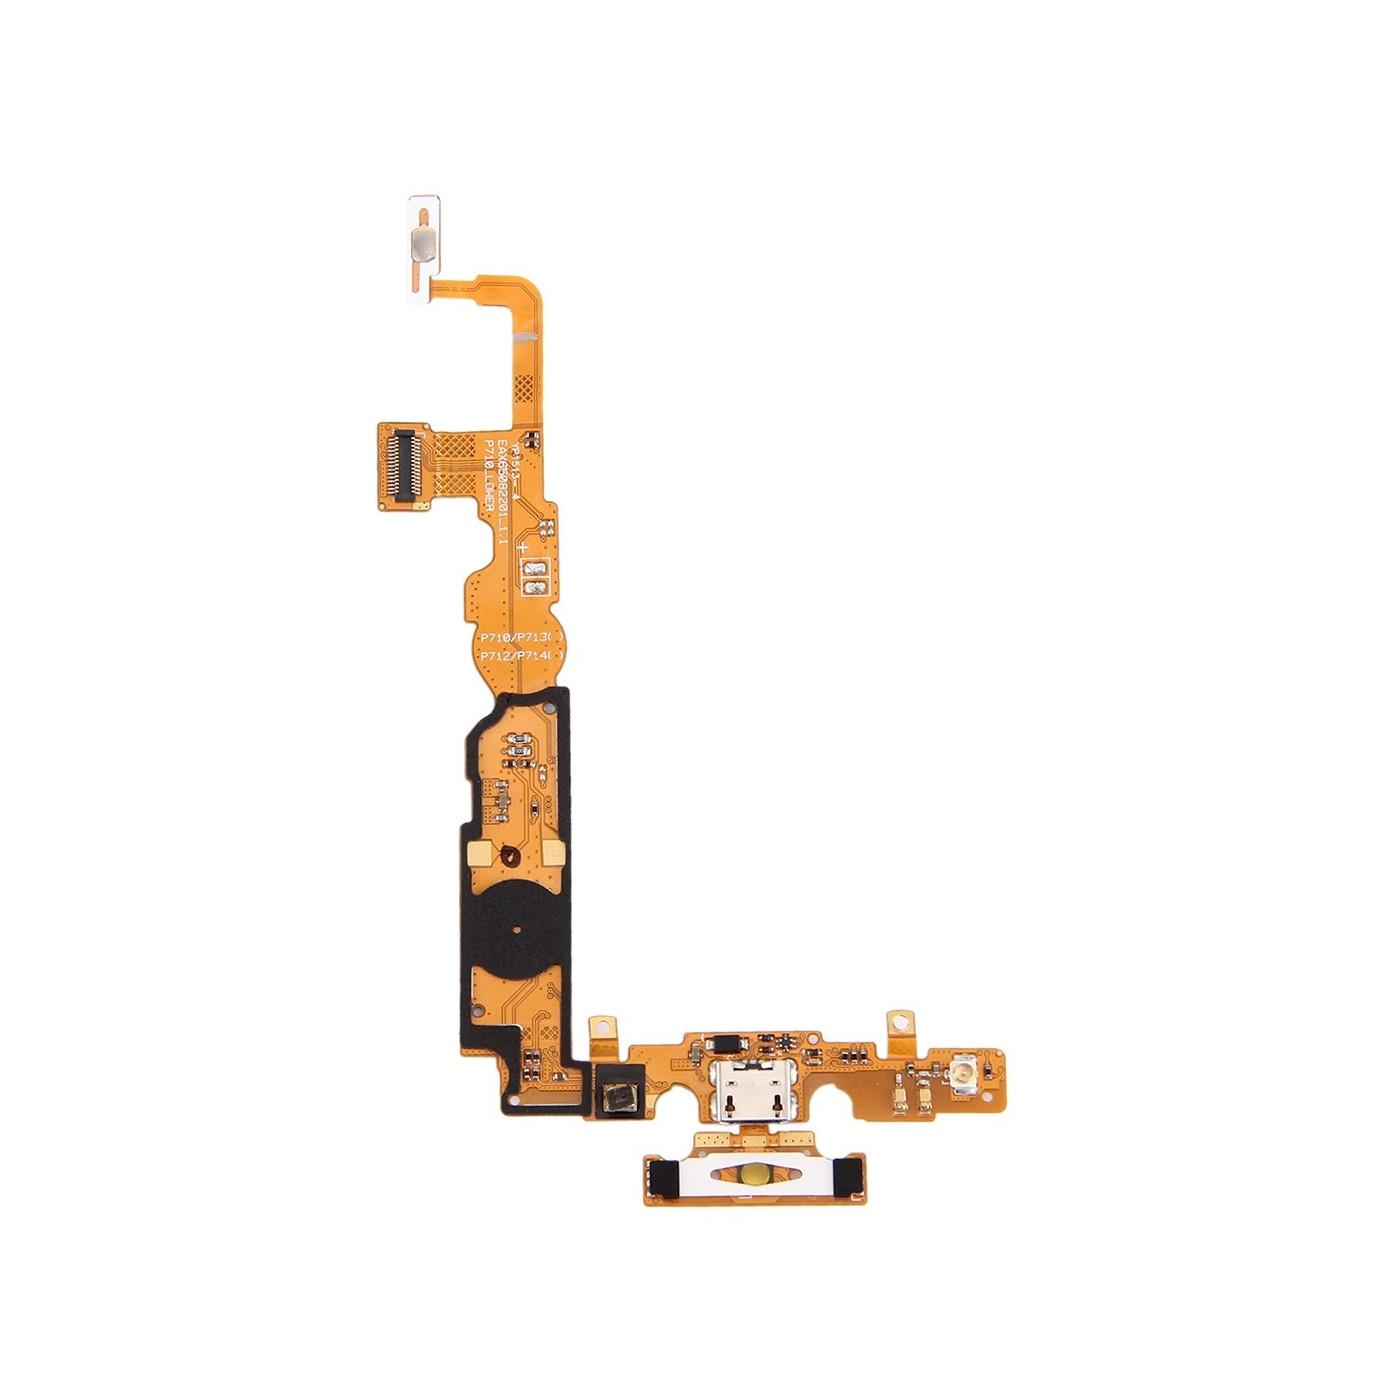 Flat Flex Ladestecker für LG Optimus L7 II / P710 Ladestation